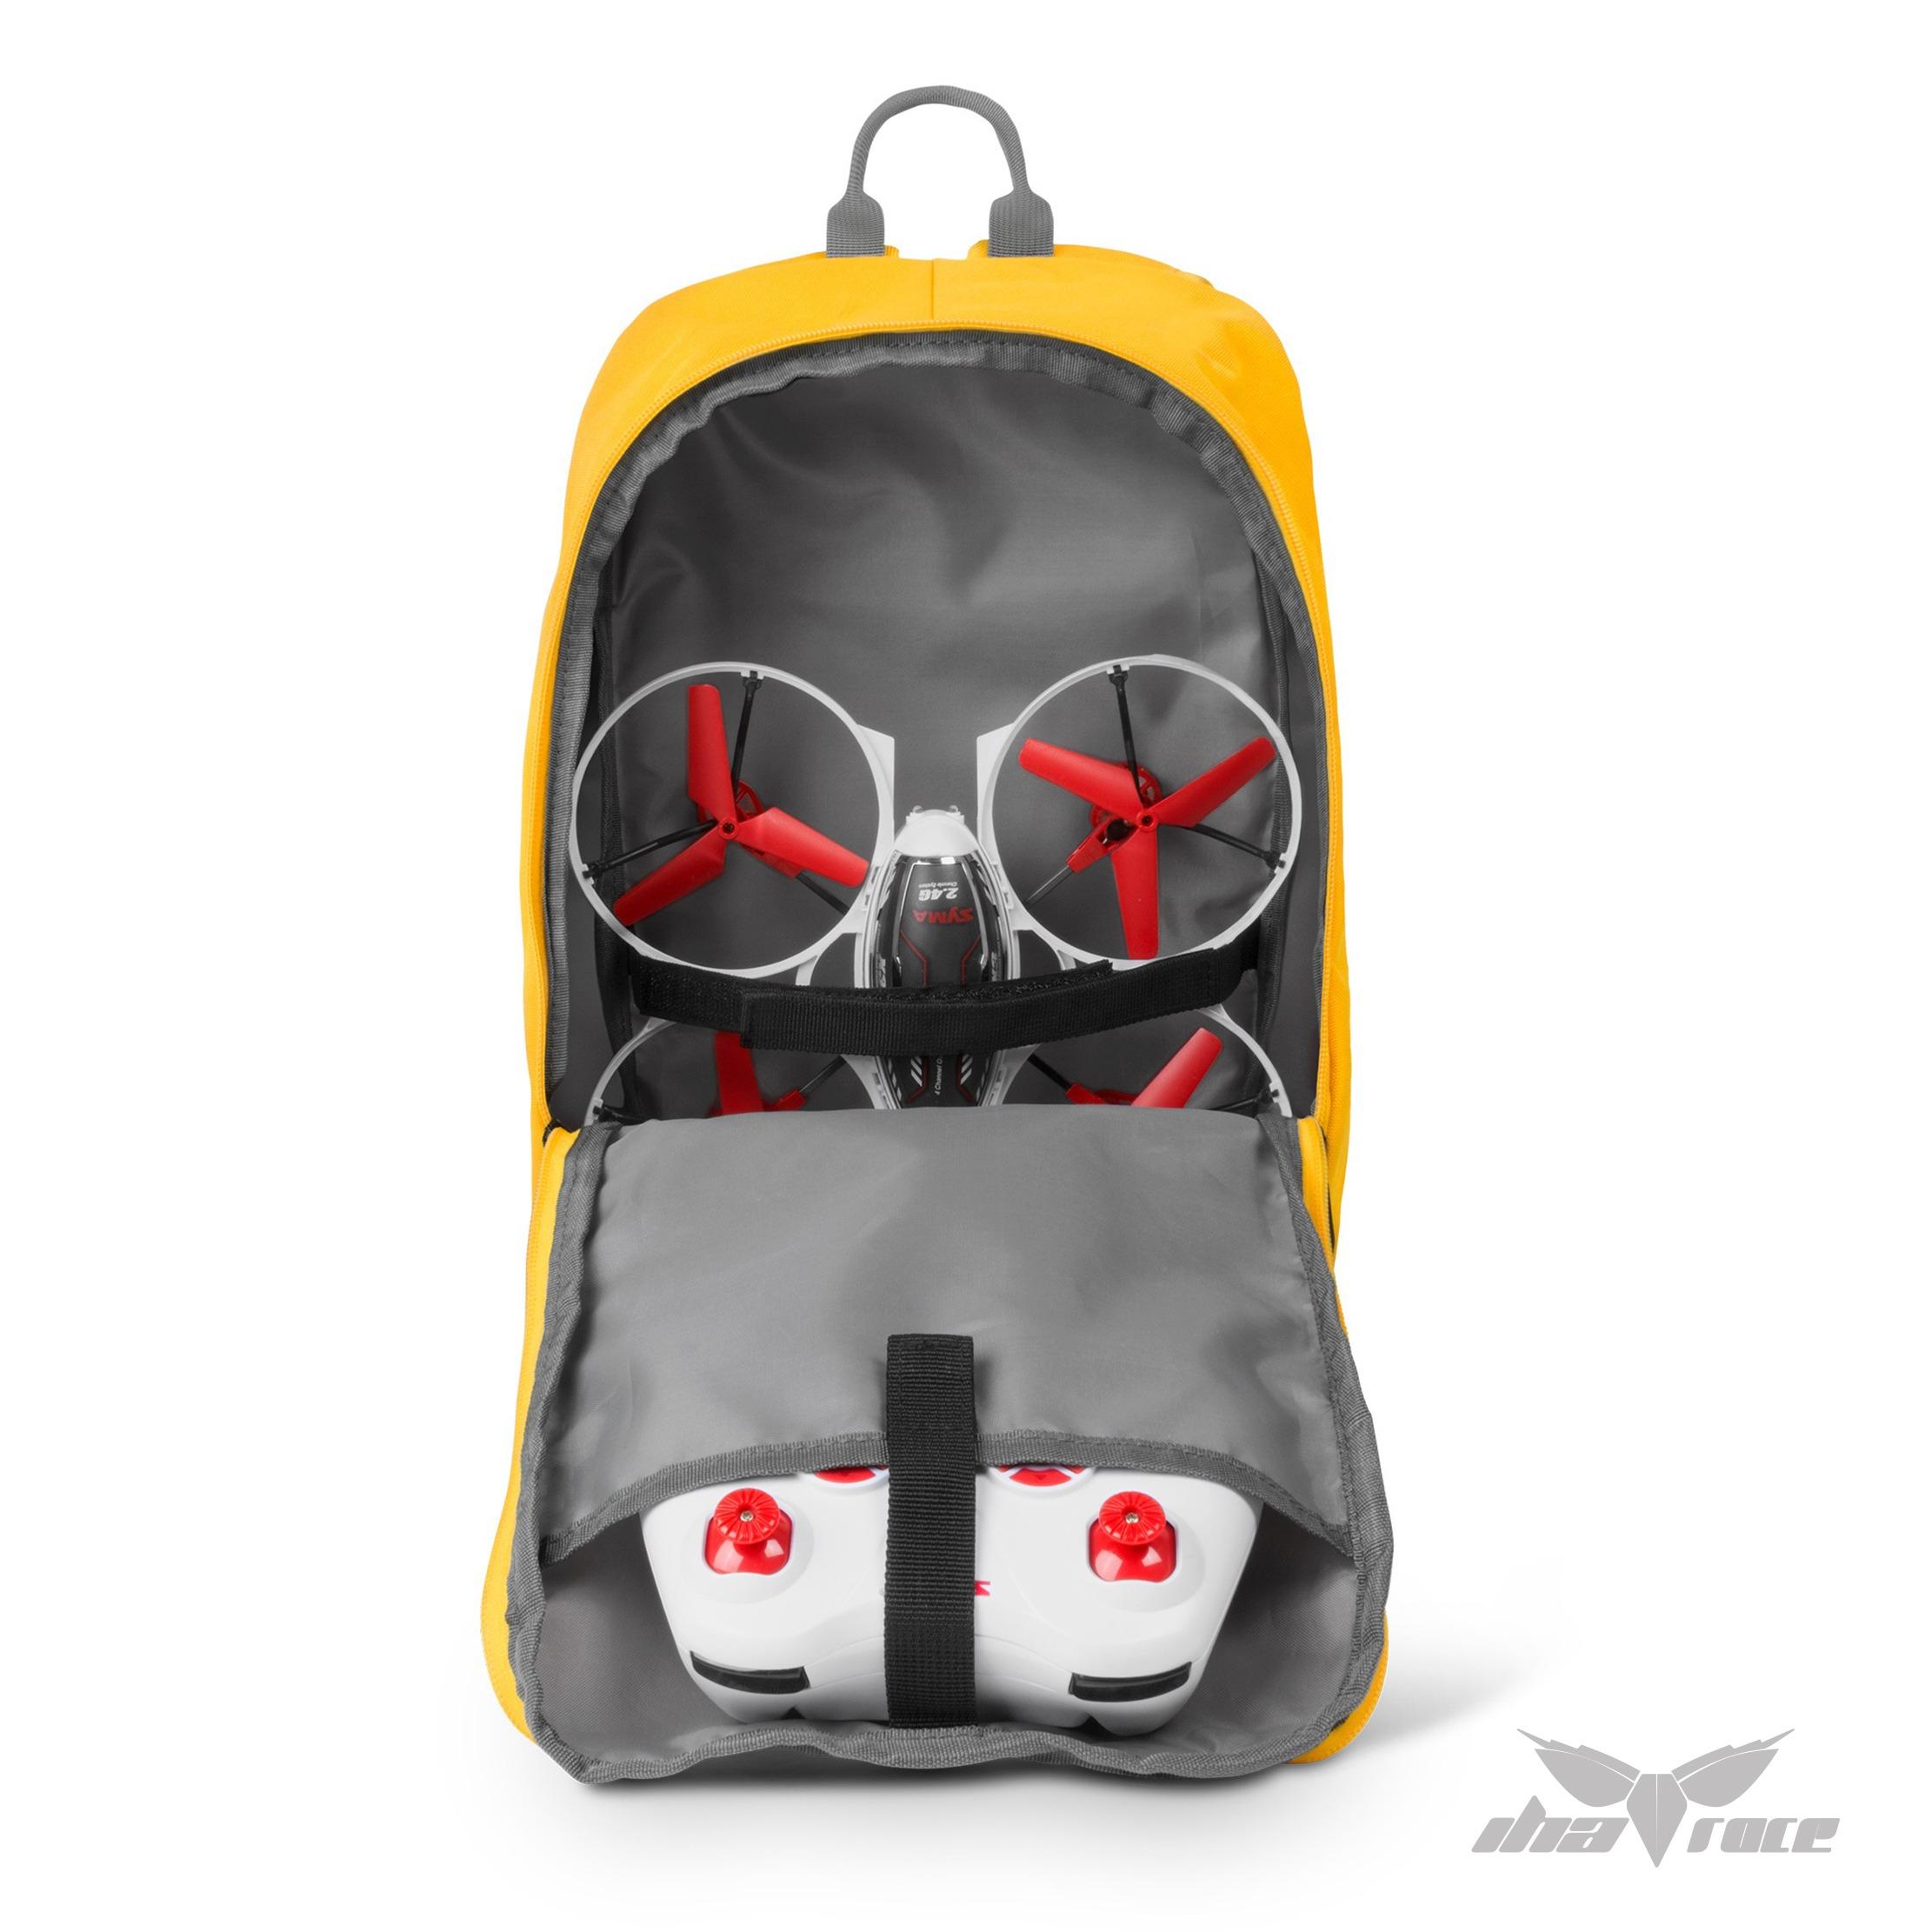 Torvol Drone Session ofertas